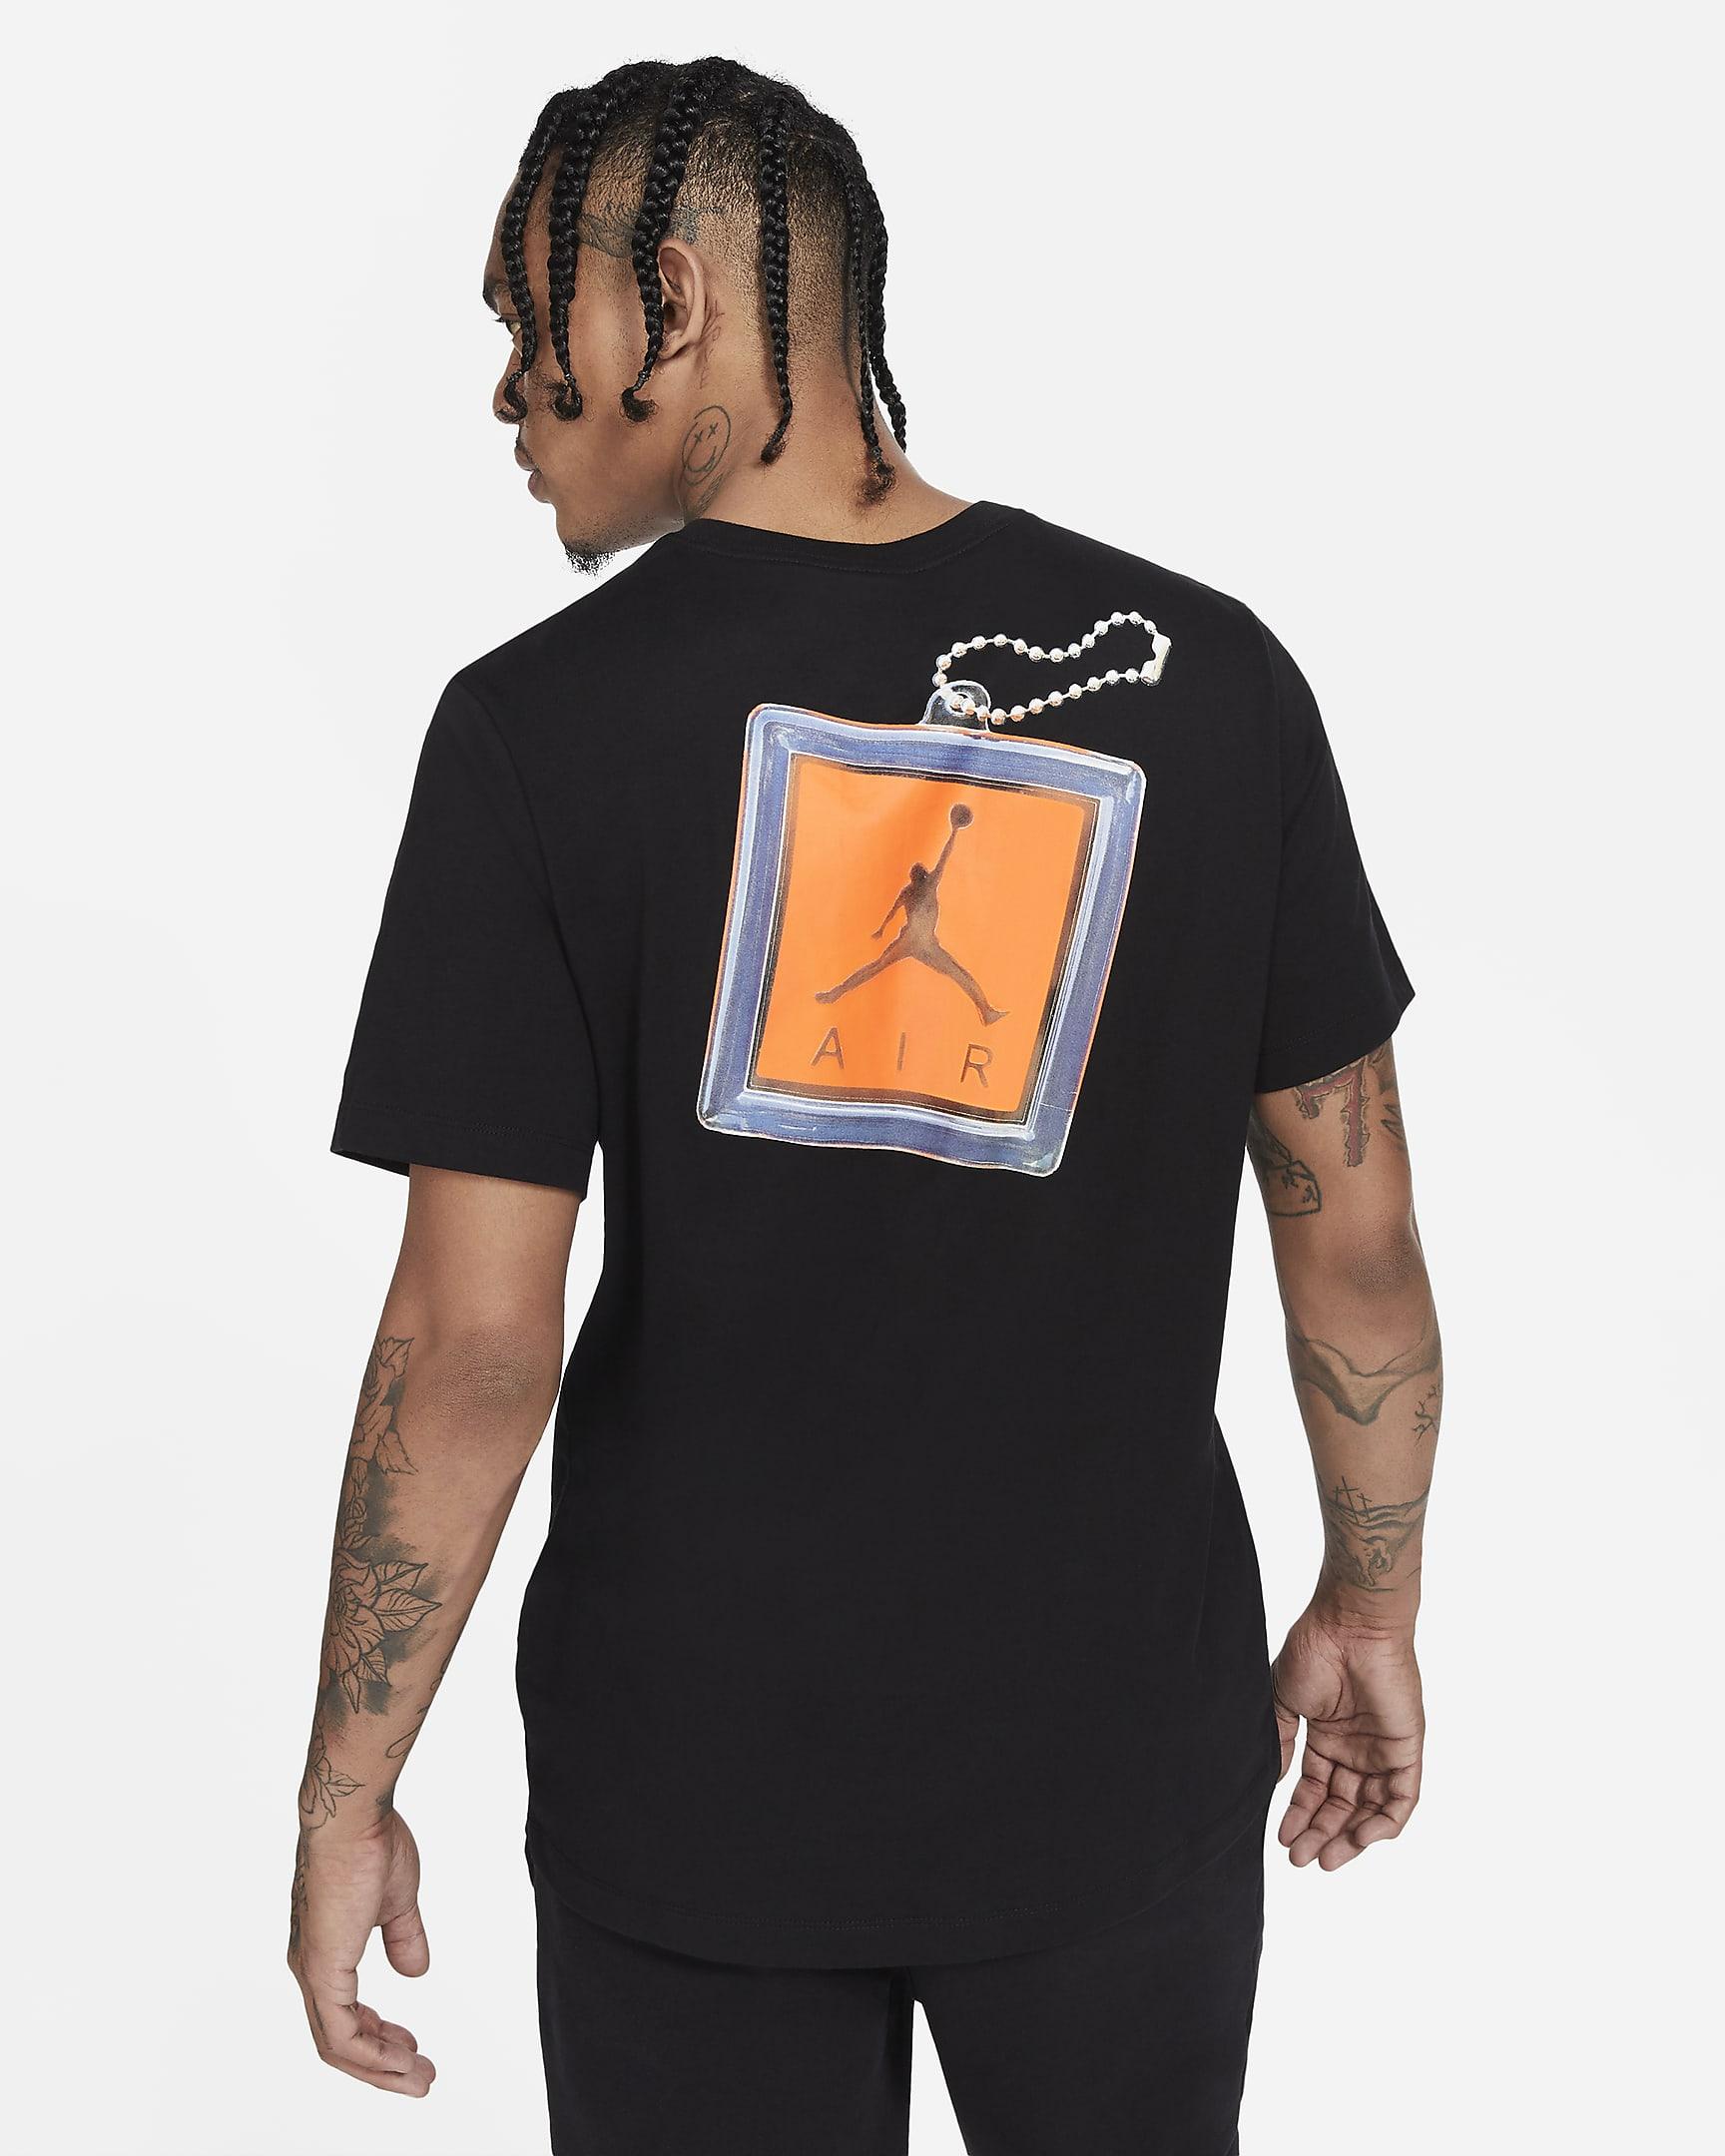 jordan-keychain-mens-short-sleeve-t-shirt-jLCQf2-1